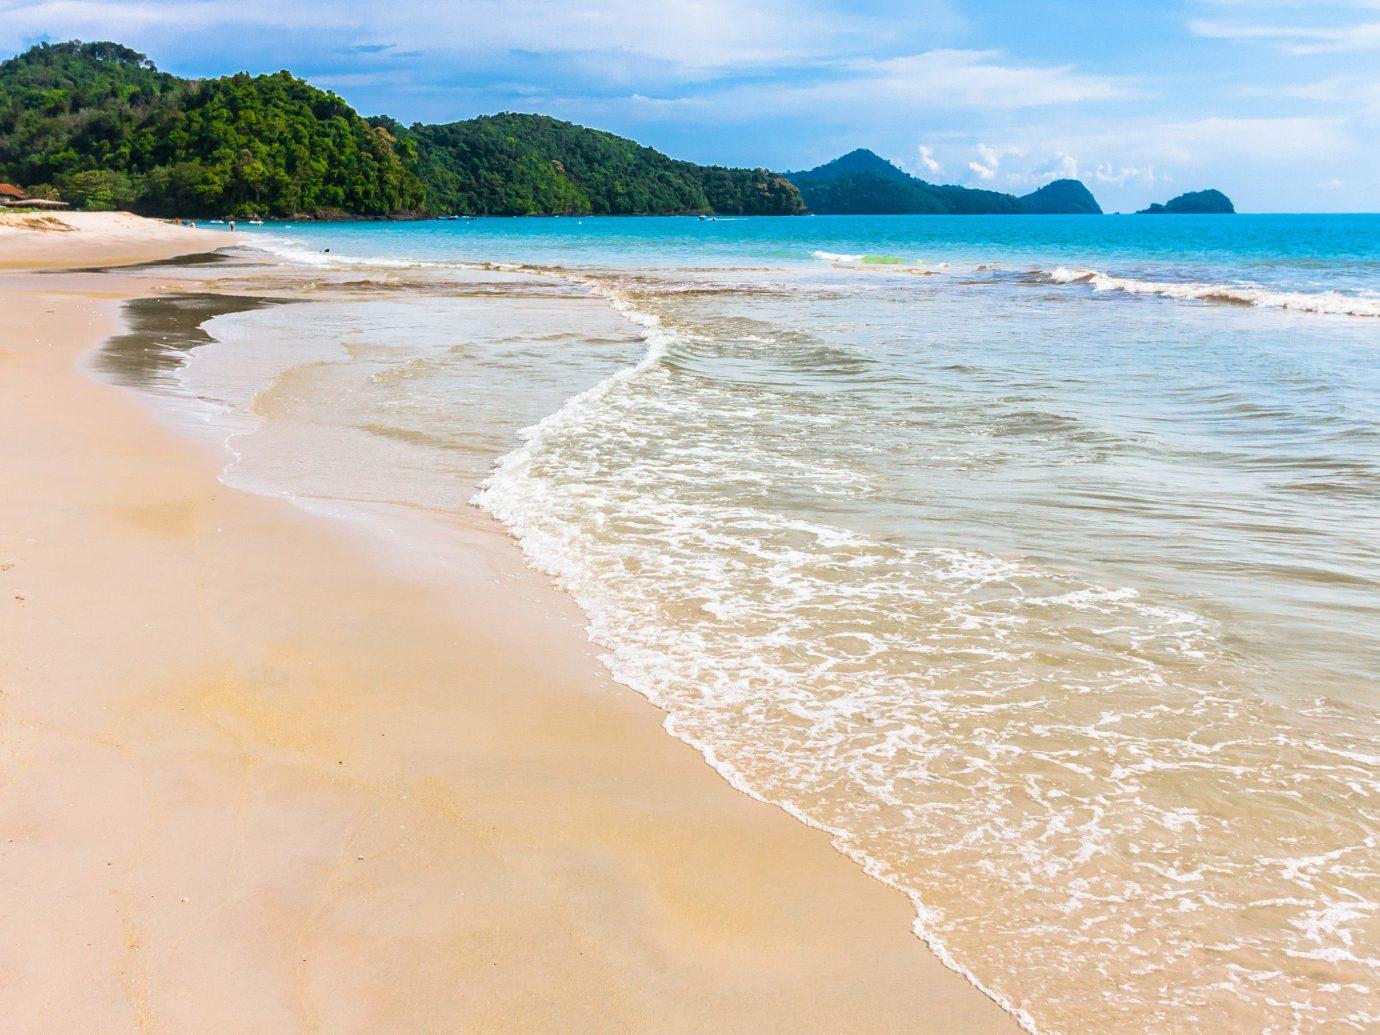 Romantic Getaways sky outdoor water Beach Nature Sea coastal and oceanic landforms shore body of water Coast Ocean wave sand wind wave caribbean bay vacation tropics horizon cape tide sandy day